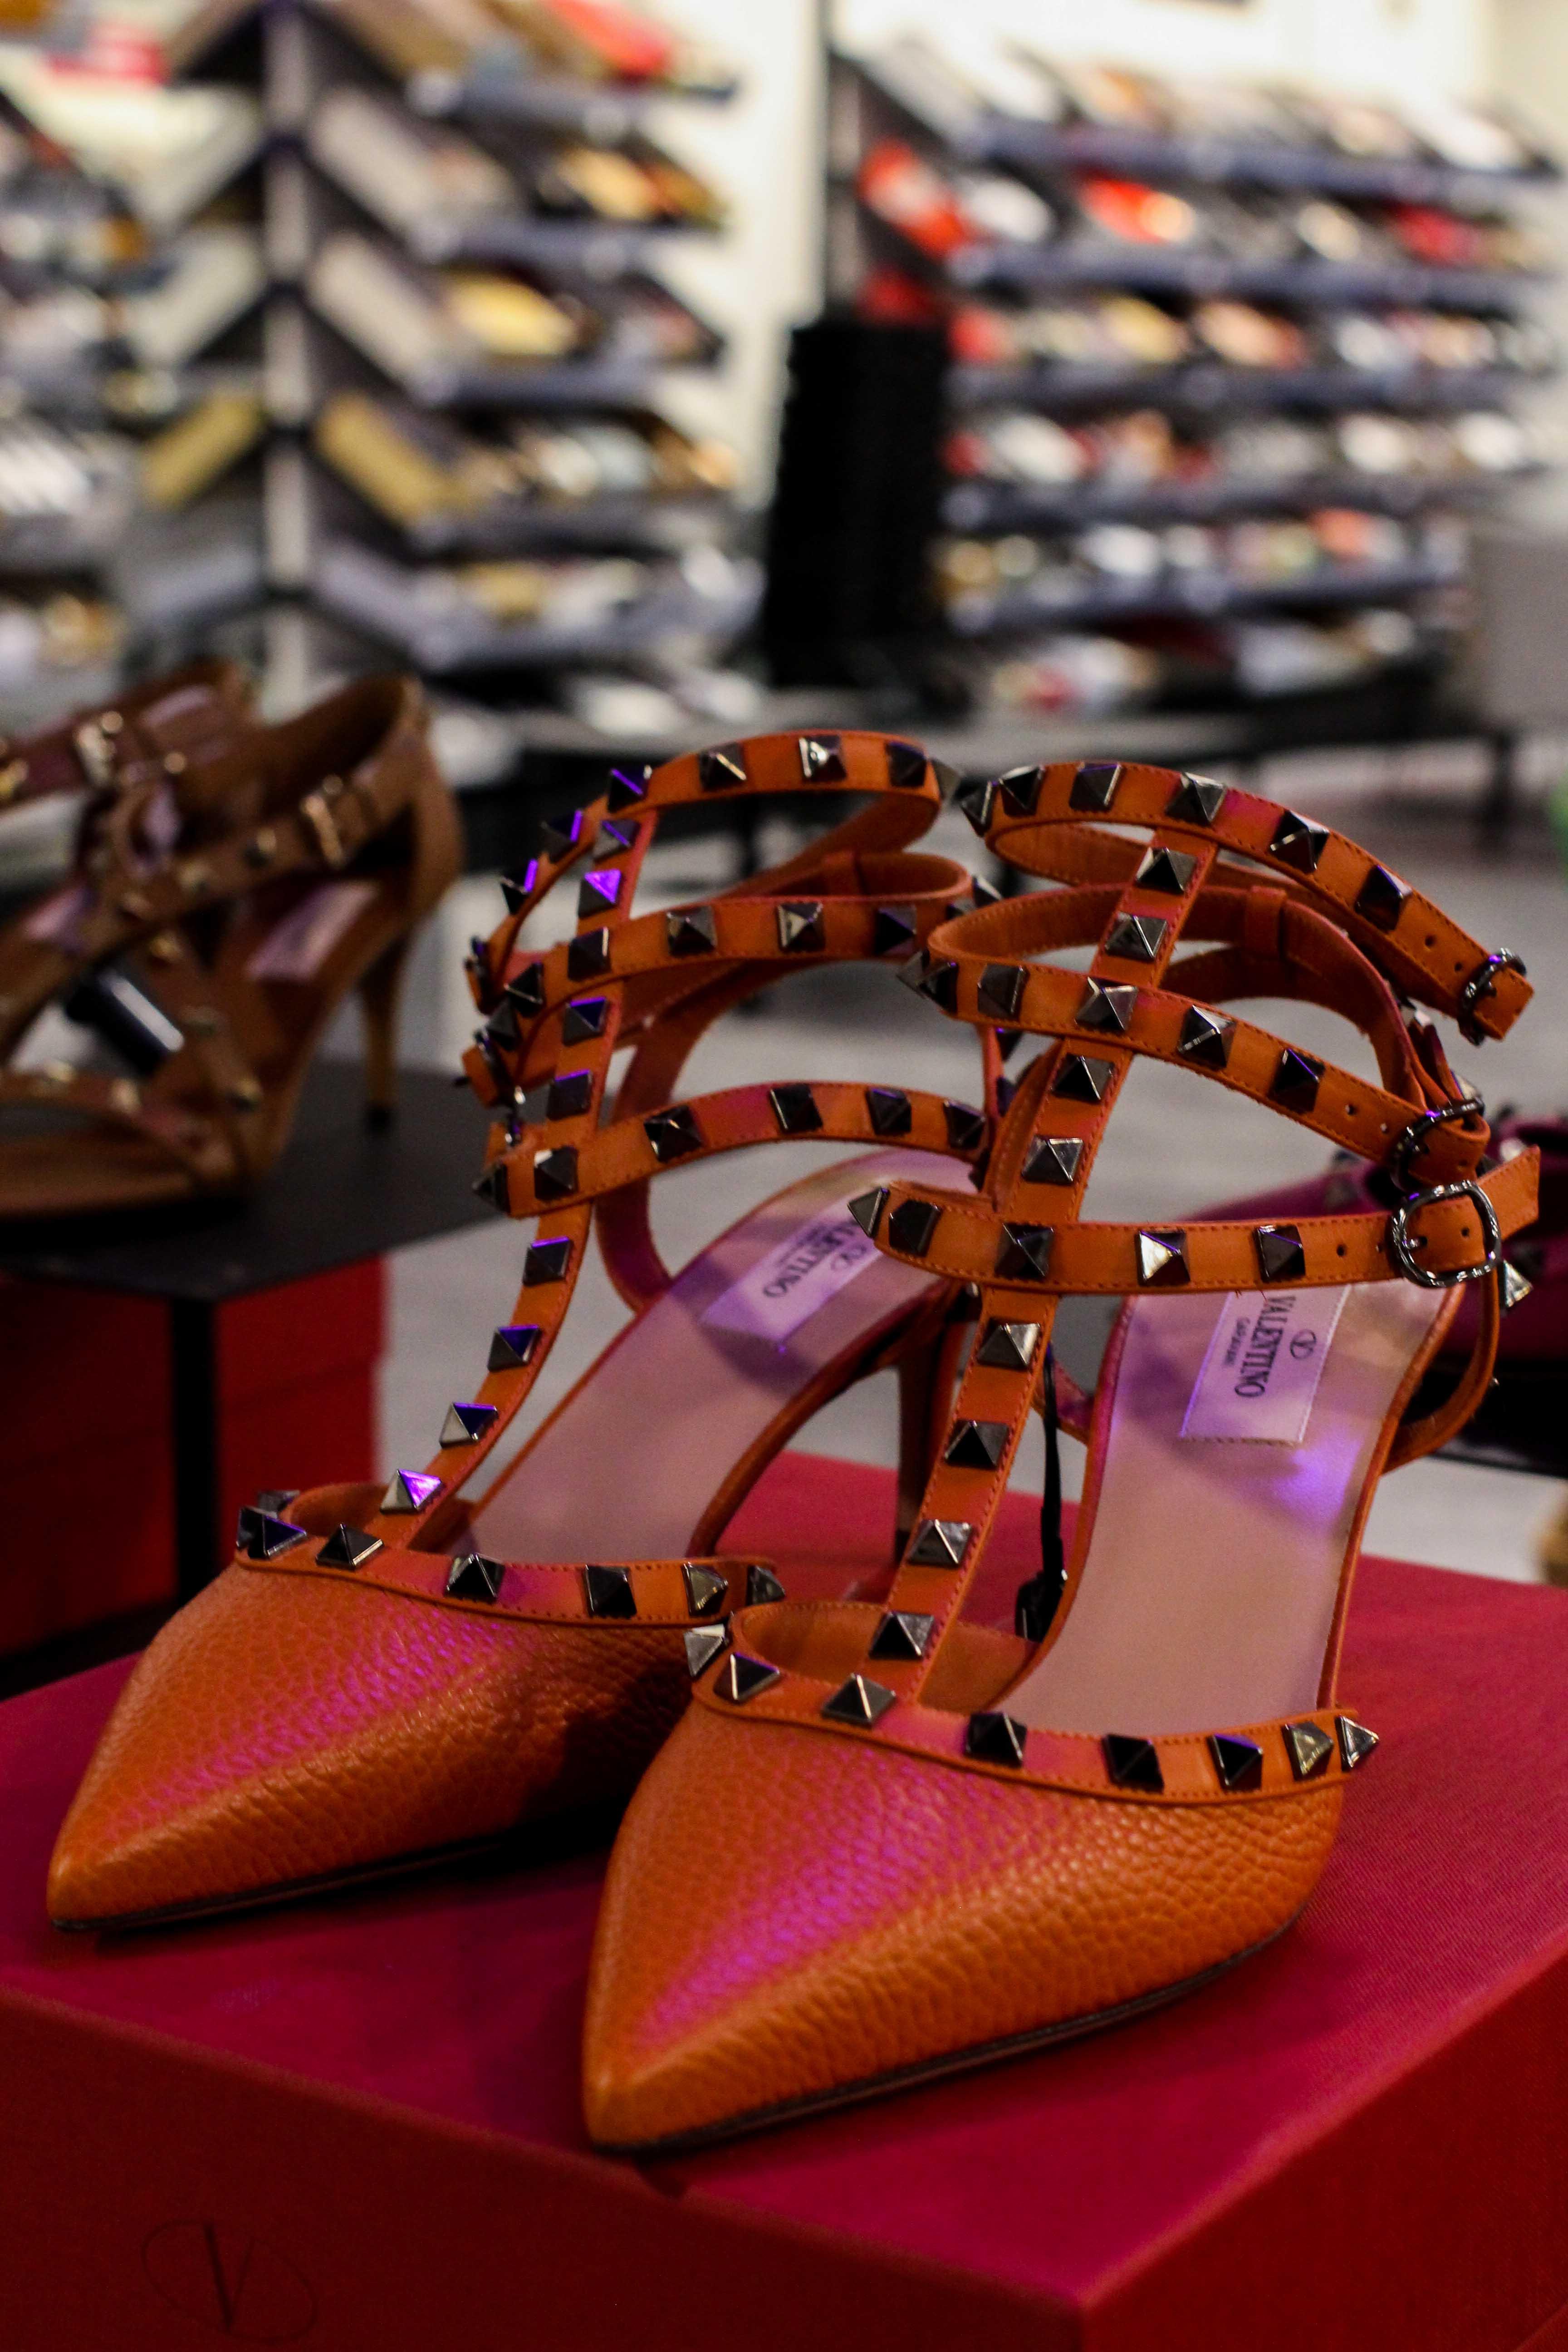 Louis vuitton Heels nieten Store Opening Saks OFF 5th Avenue Bonn Premium-Marken Outletpreis Designer Outlet Bonn Modeblog